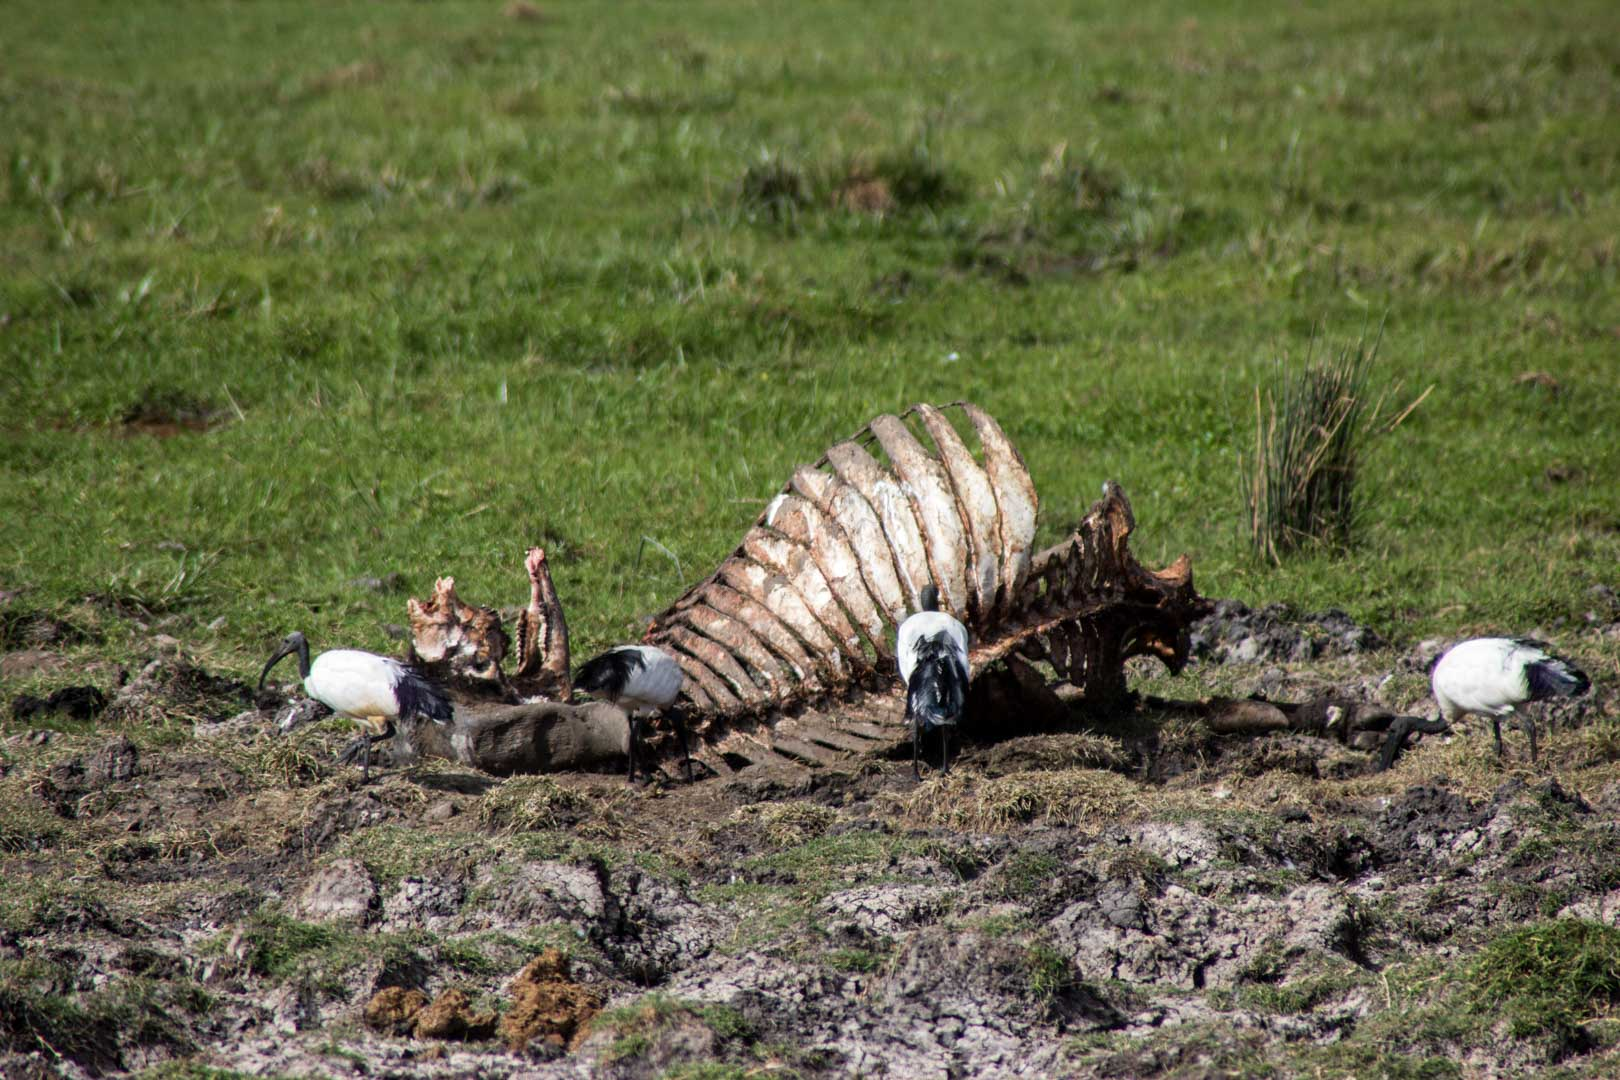 Aves alimentándose de restos de animales, Amboseli, Kenia